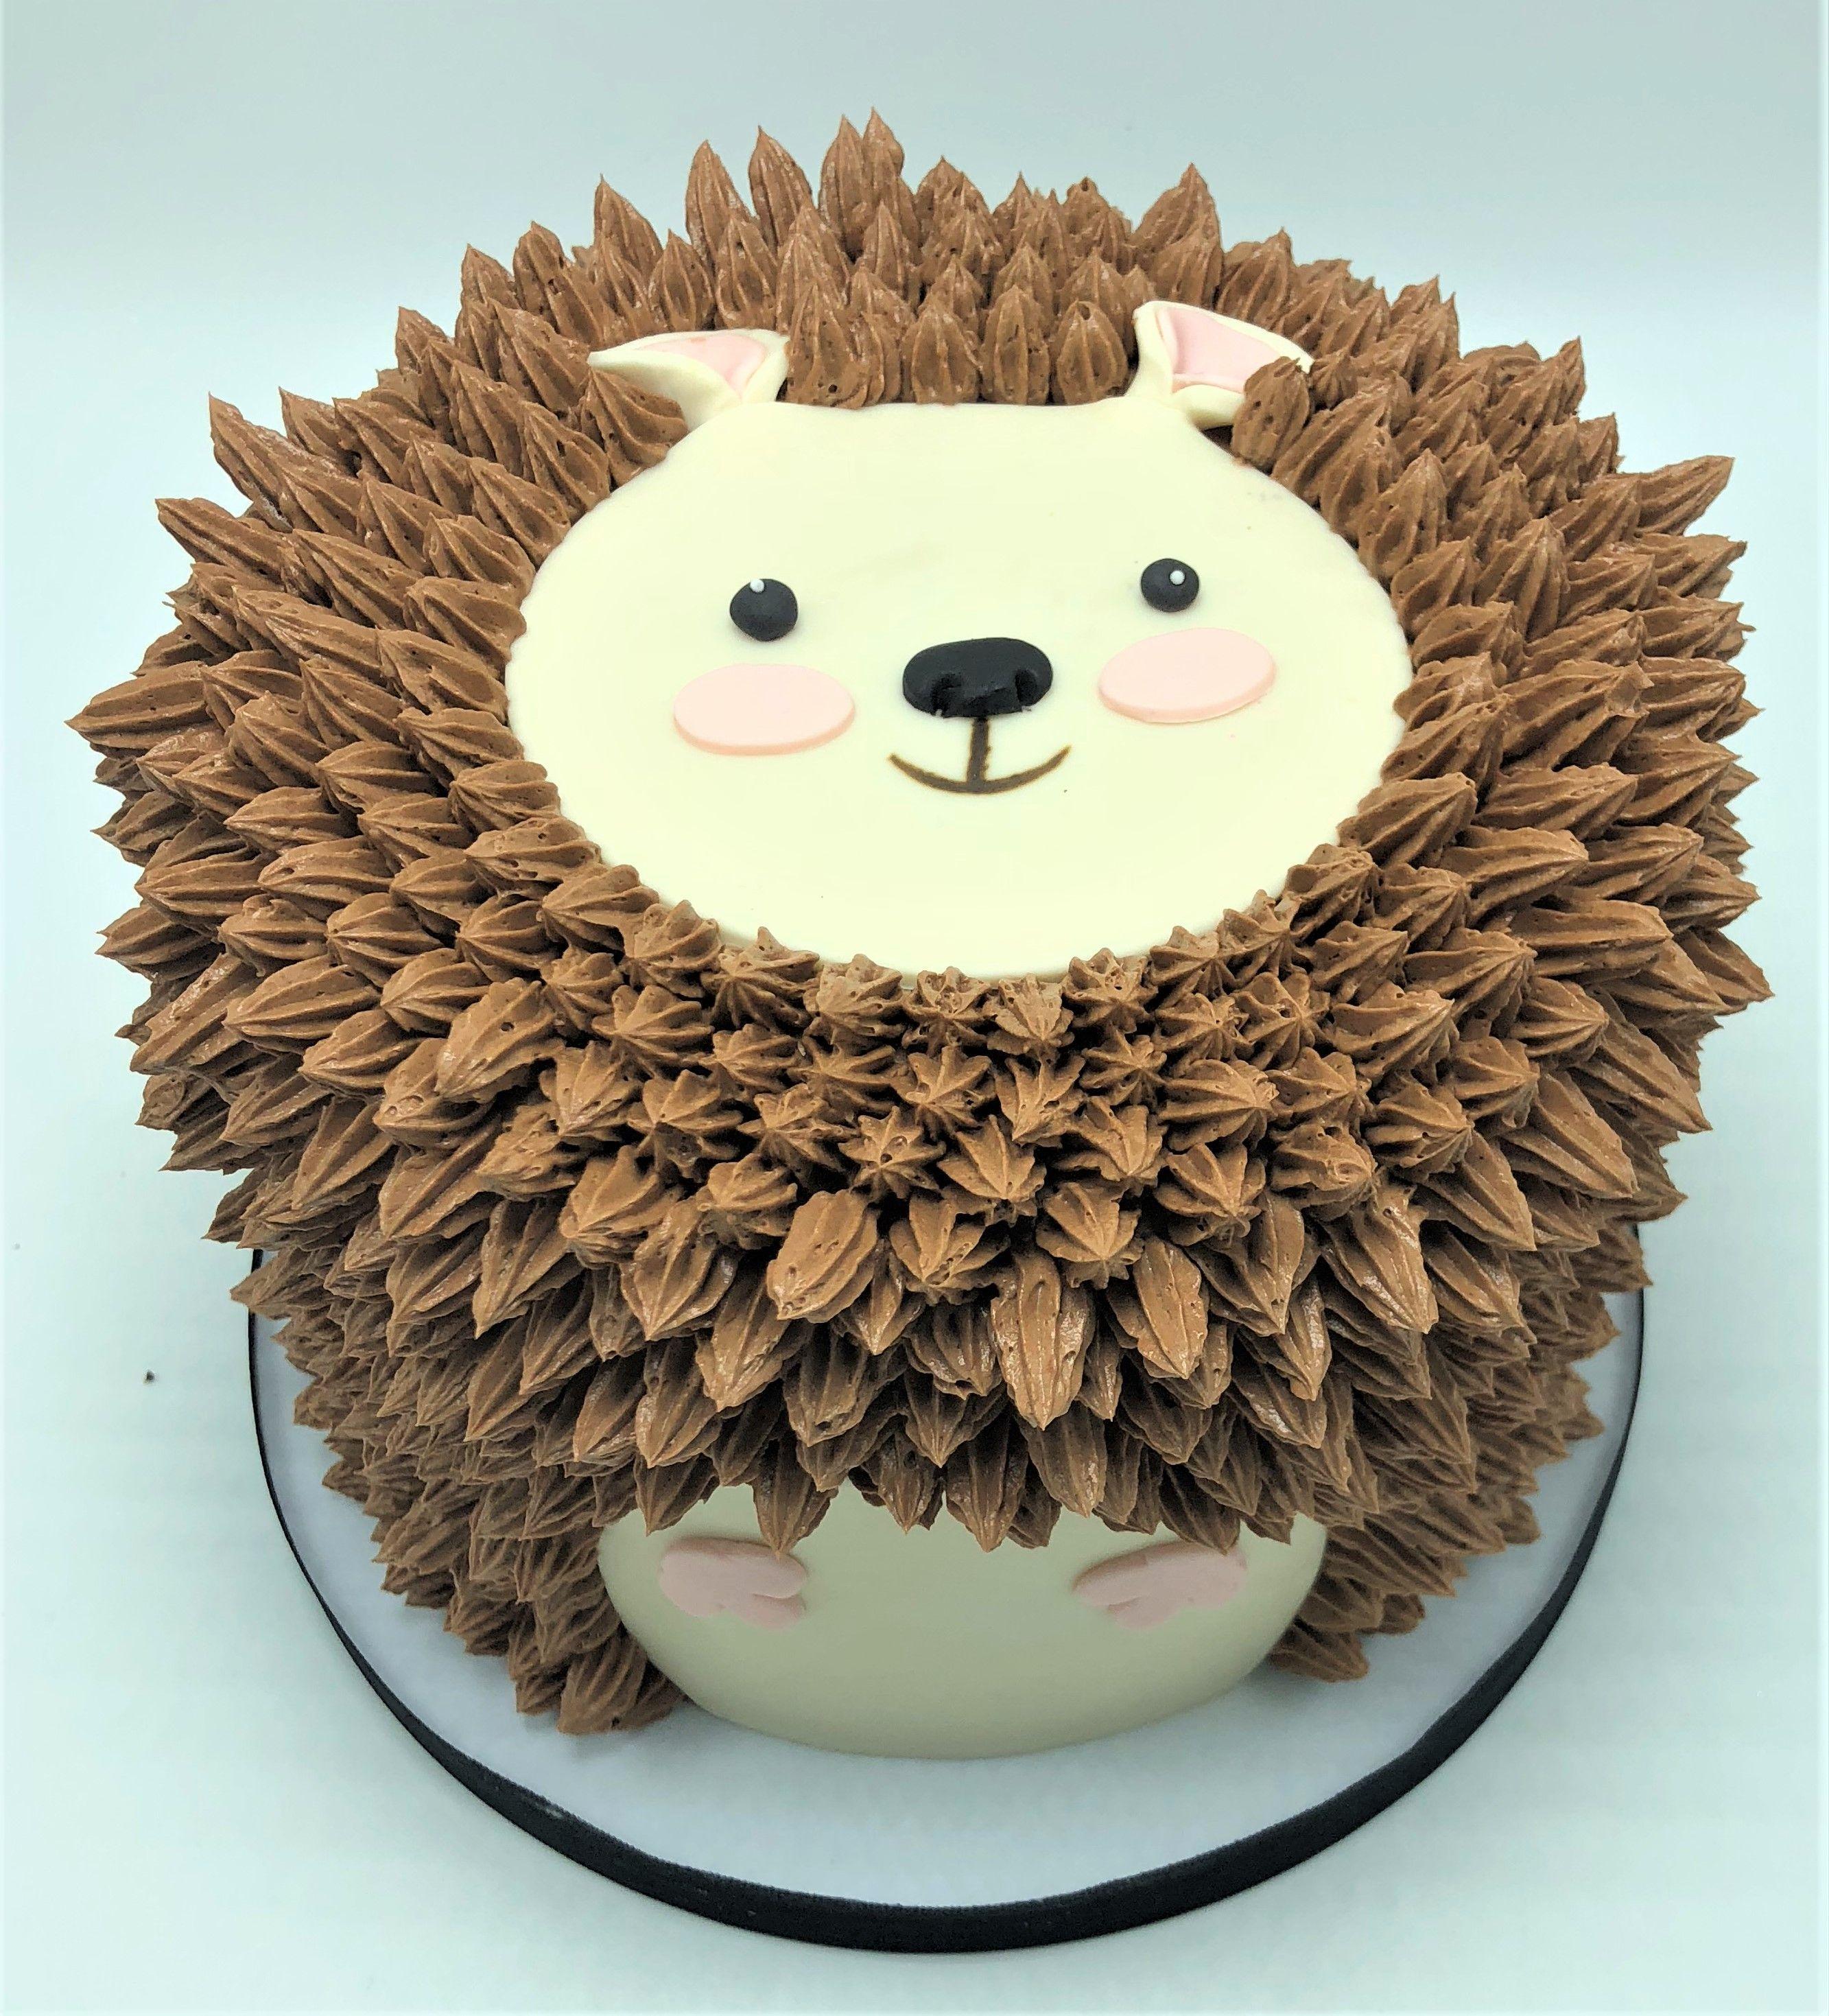 Hedgehog cake by flavor cupcakery hedgehogcake hedgehog